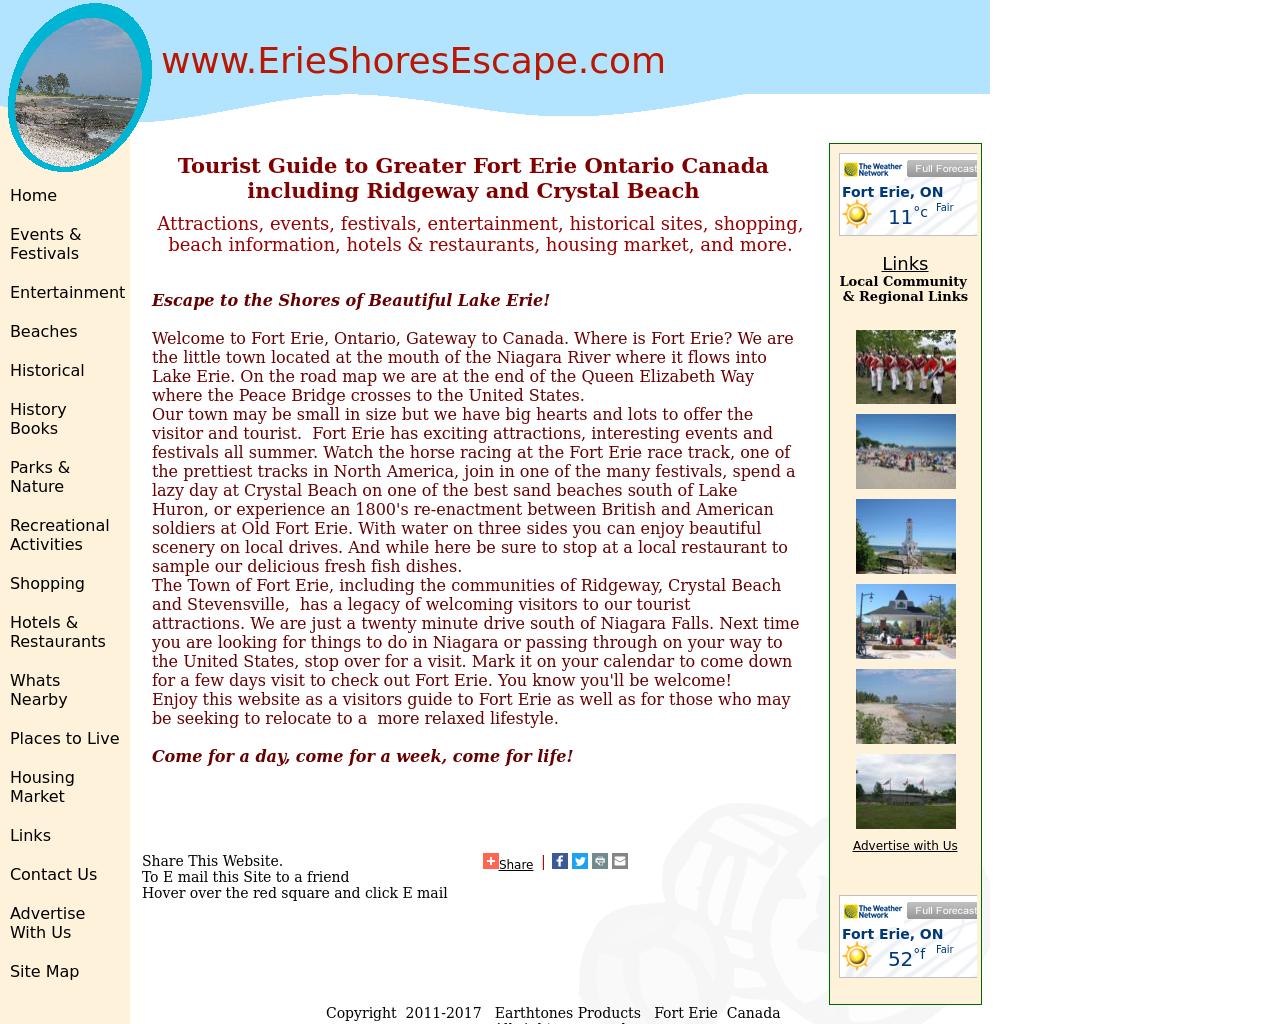 www.ErieShoresEscape.com-Advertising-Reviews-Pricing